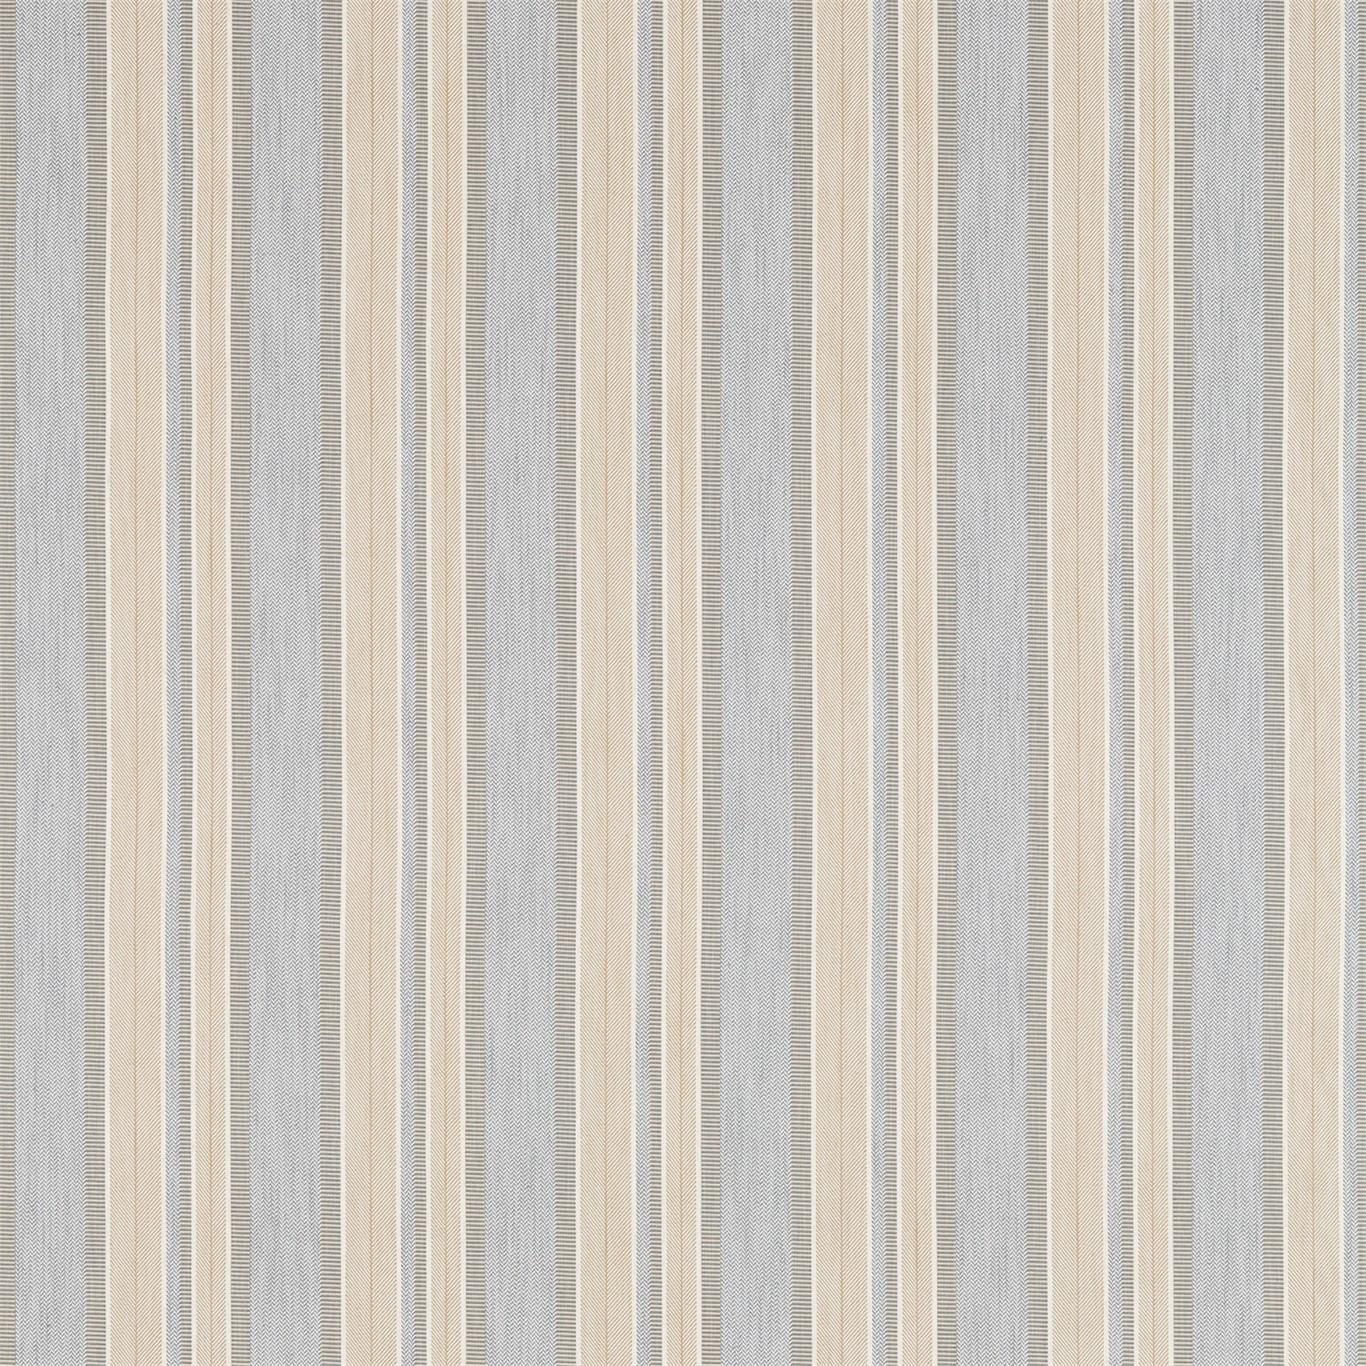 Image of Sanderson Home Alcott Mineral/Stone Fabric 236418